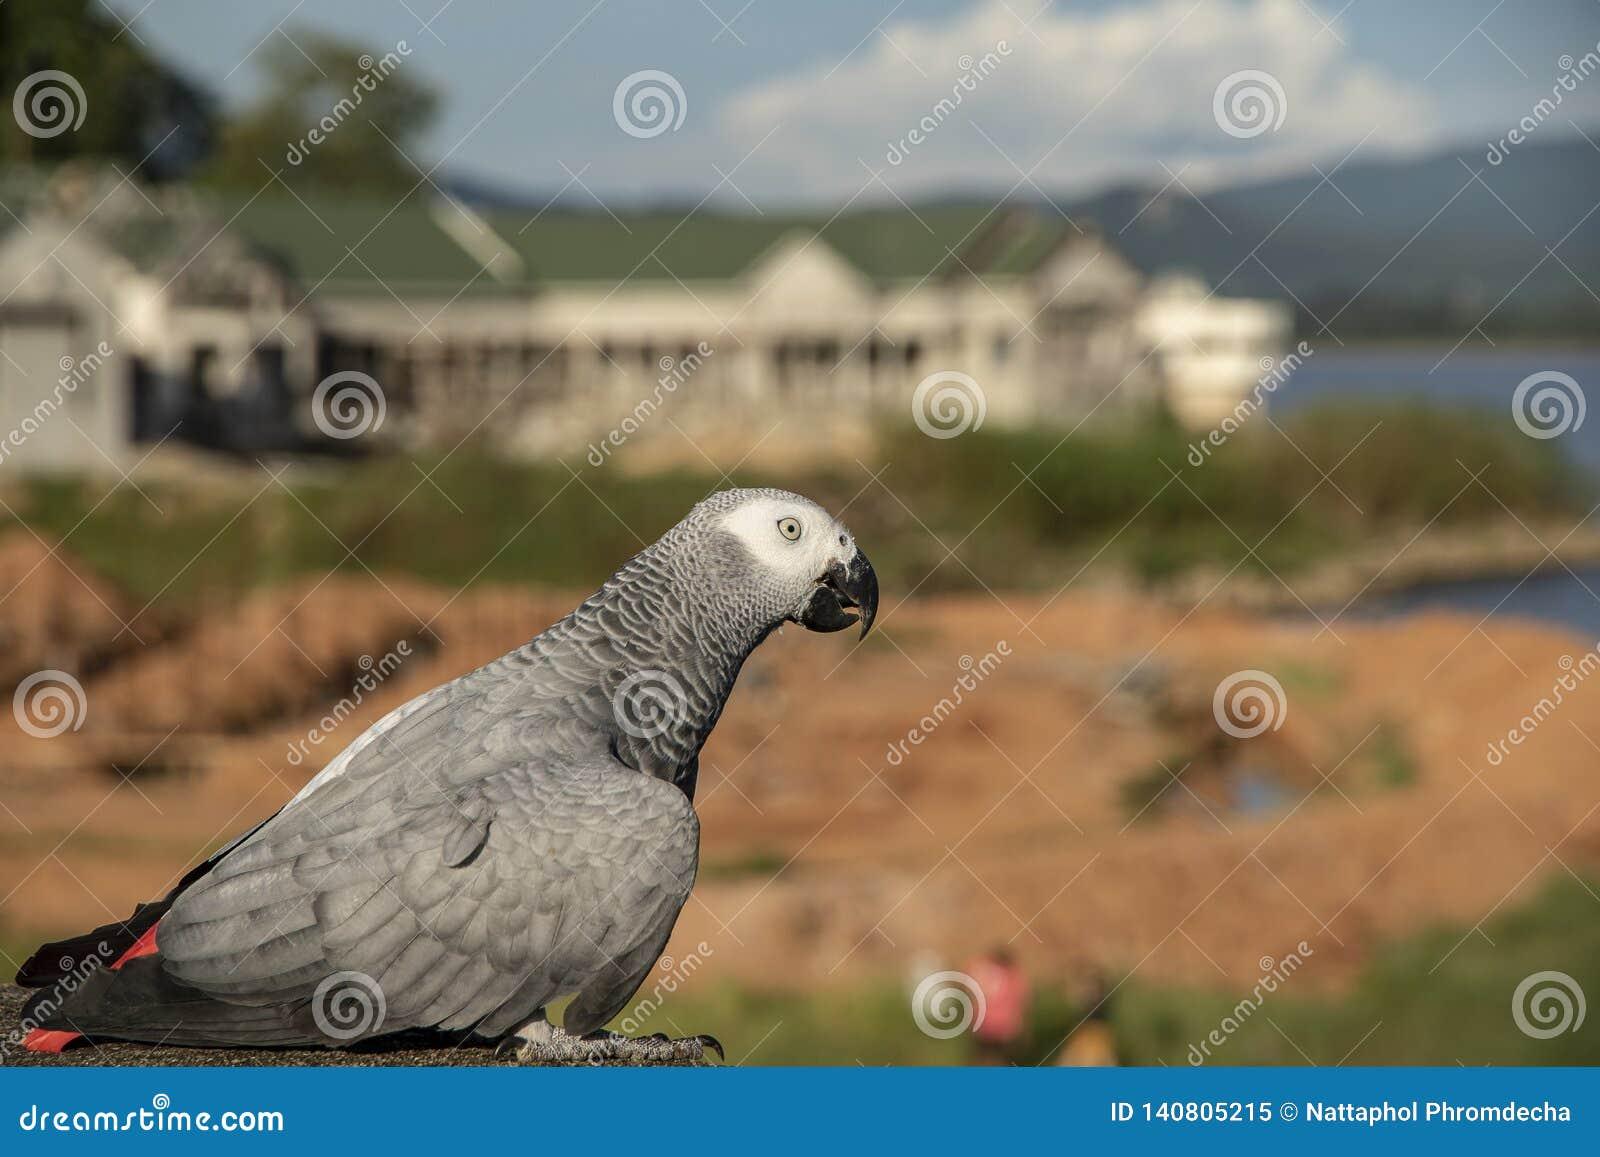 Papagaio ascendente próximo do pássaro do macore no fundo borrado